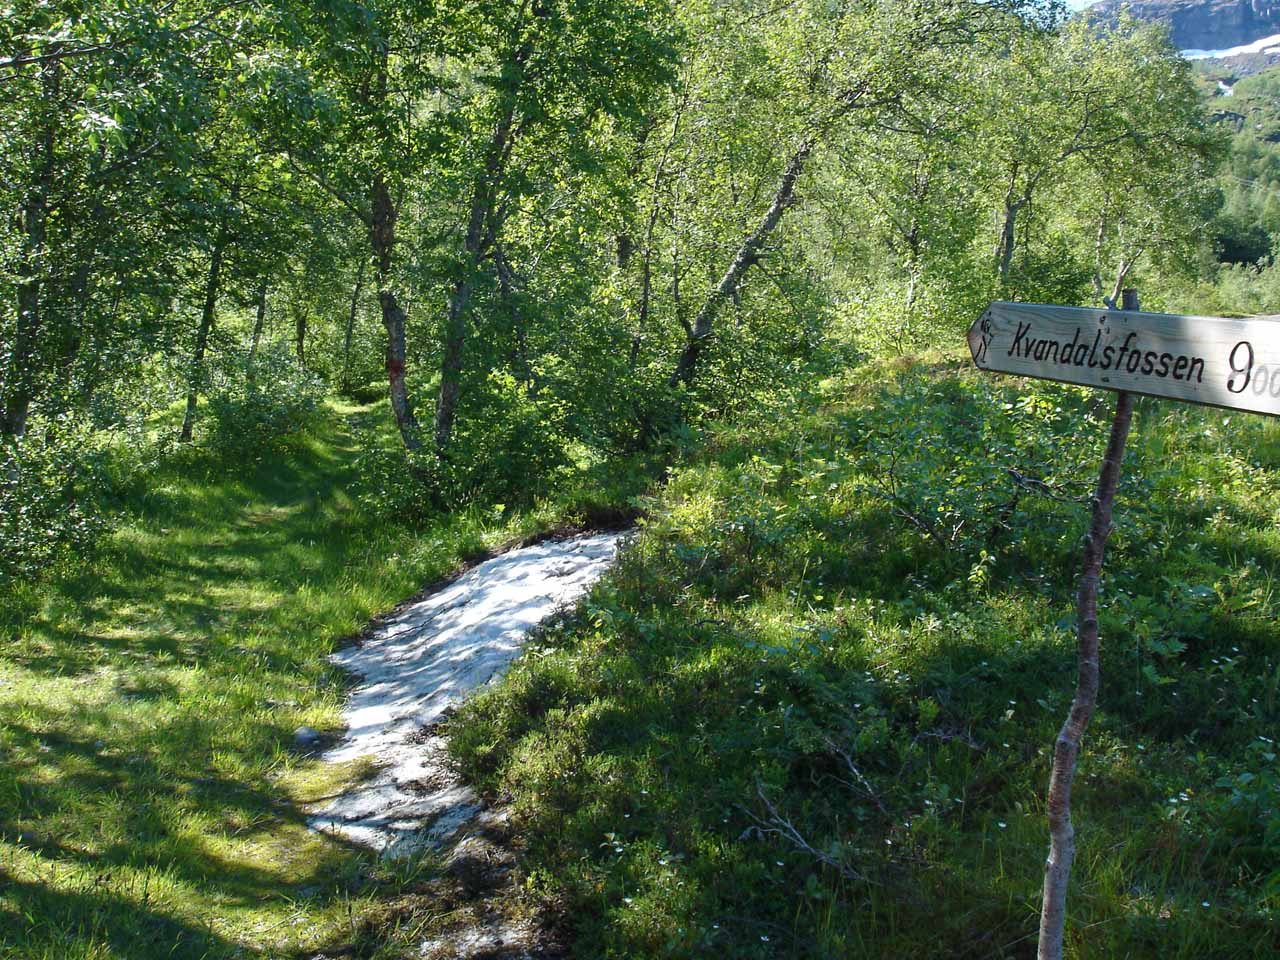 The Kvanddalsfossen sign at the trailhead